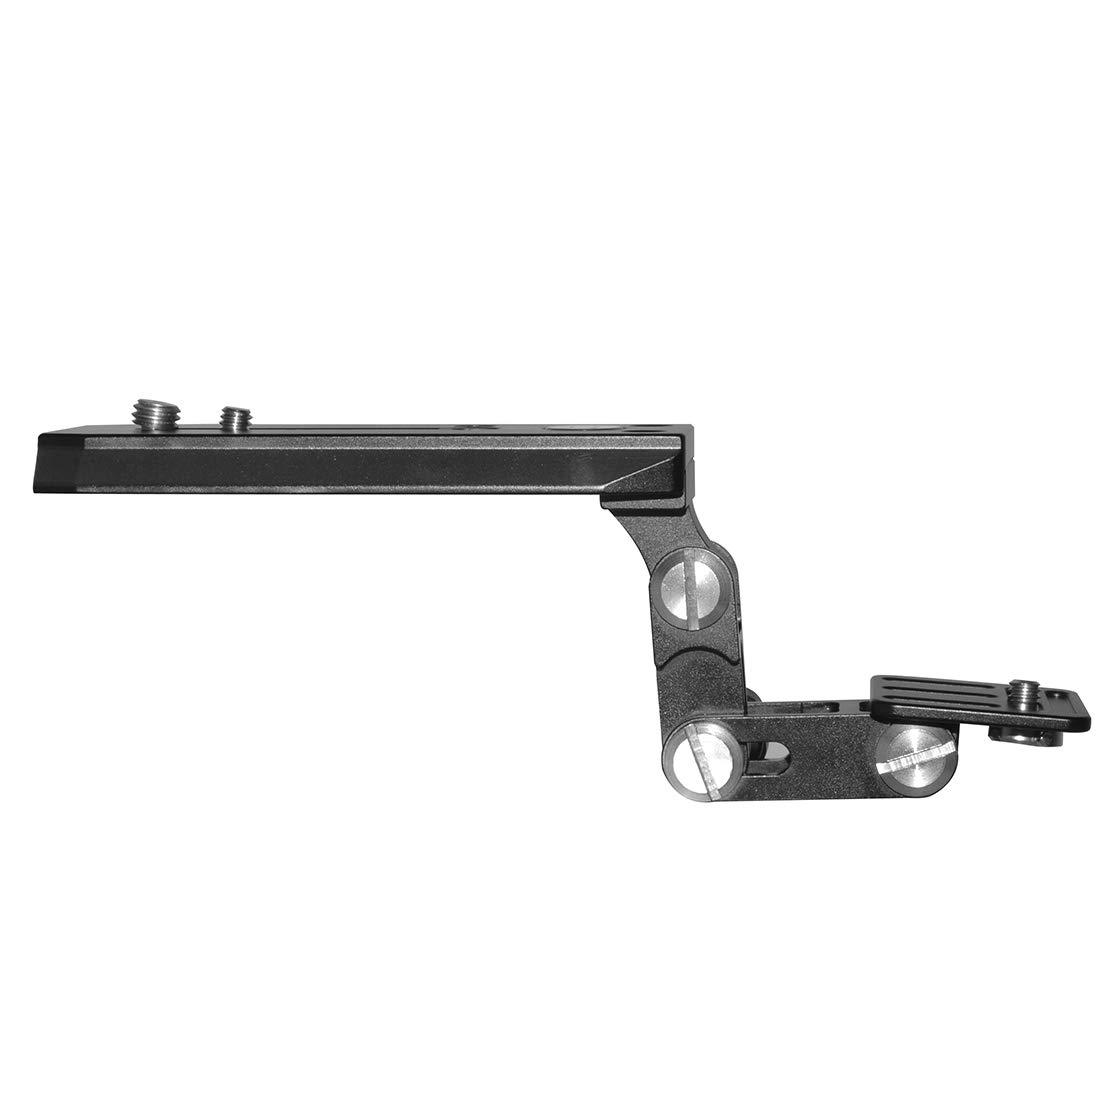 XT-XINTE Telephoto Lens Long Focus Holder Support Bracket Kit 120mm QR Base Plate for Bird Watching SLR Camera Manfrotto Tripod